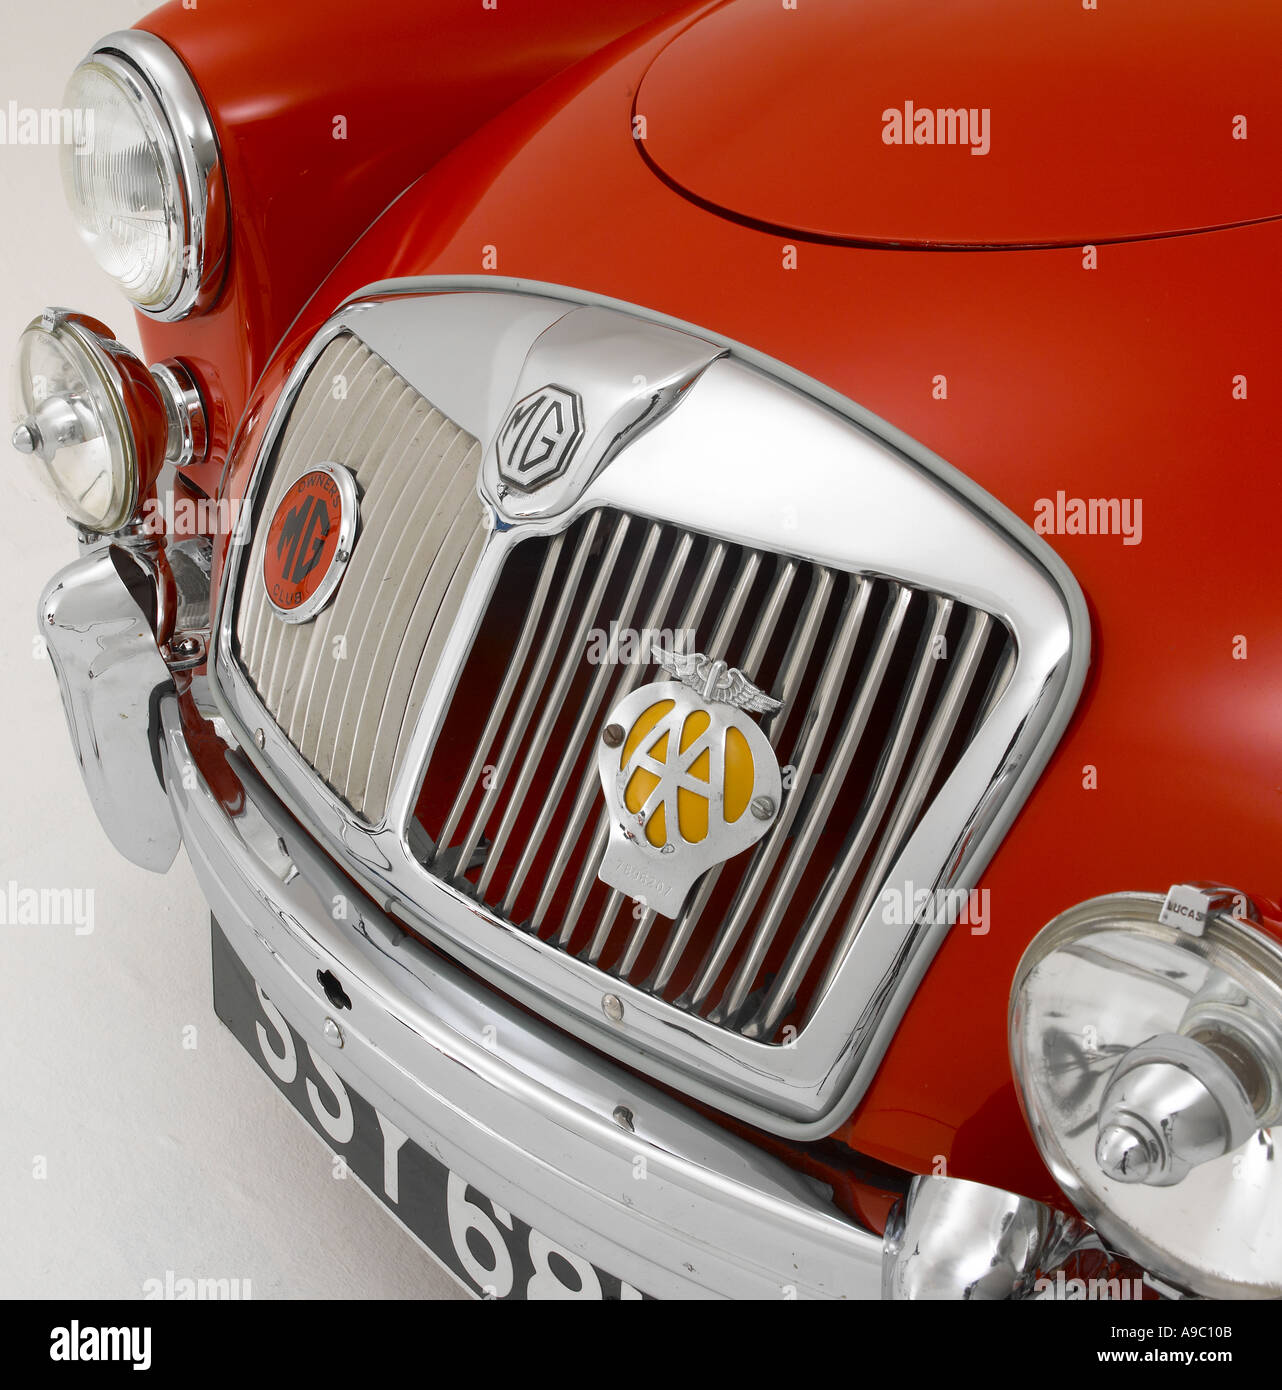 1957 MG A - Stock Image